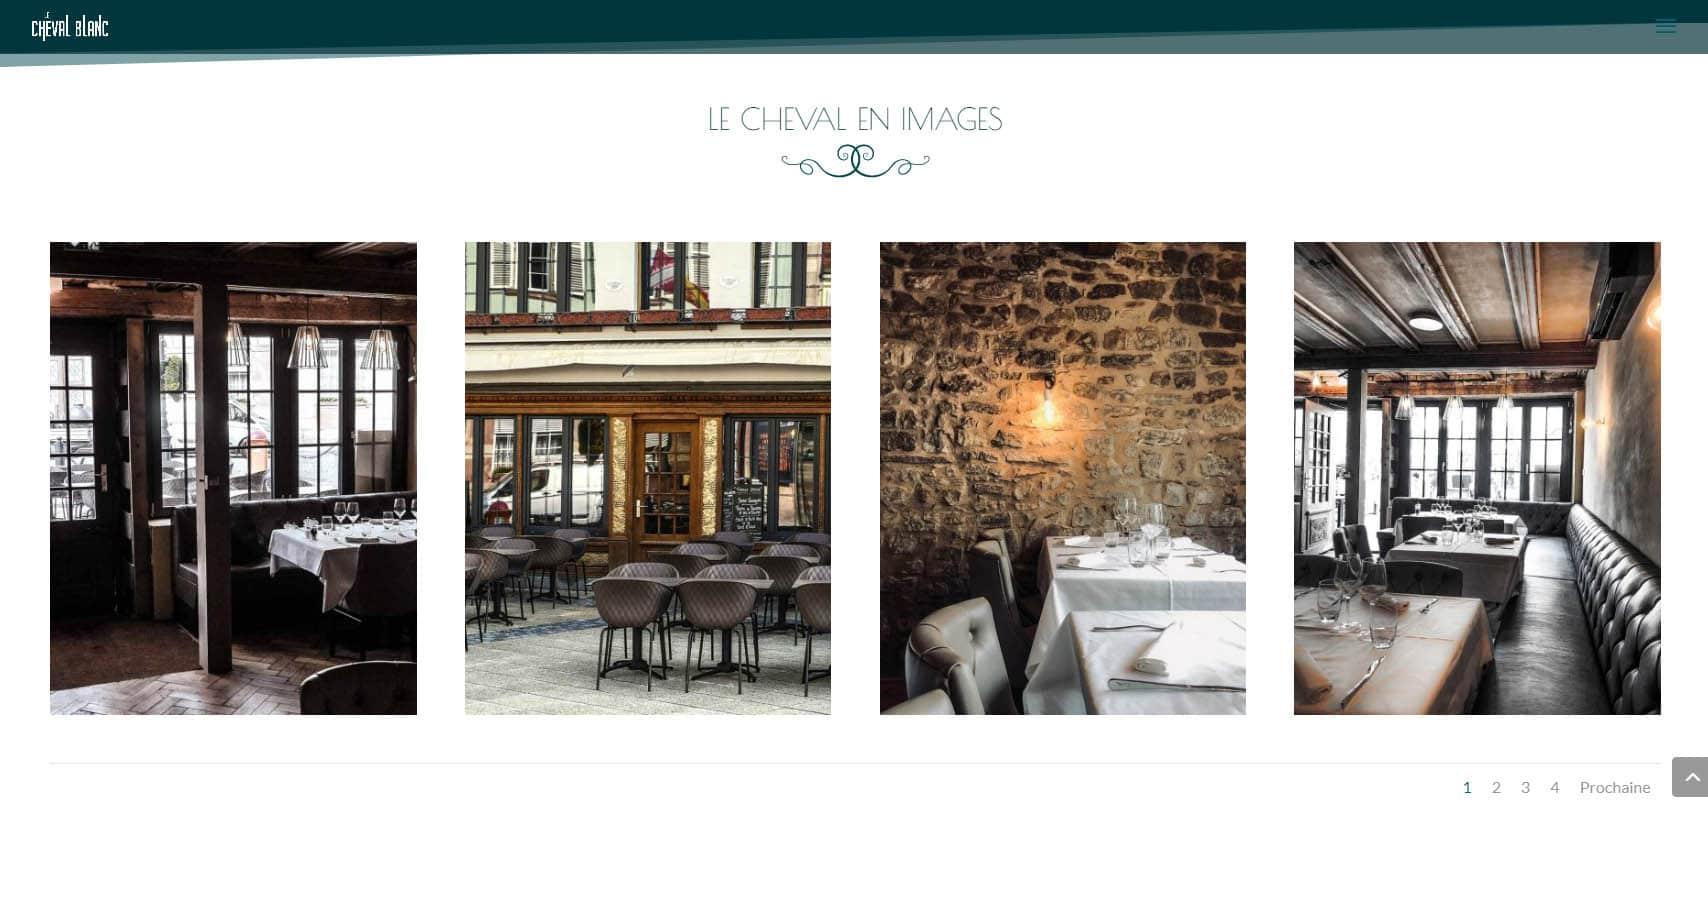 Galerie_site du Cheval Blanc